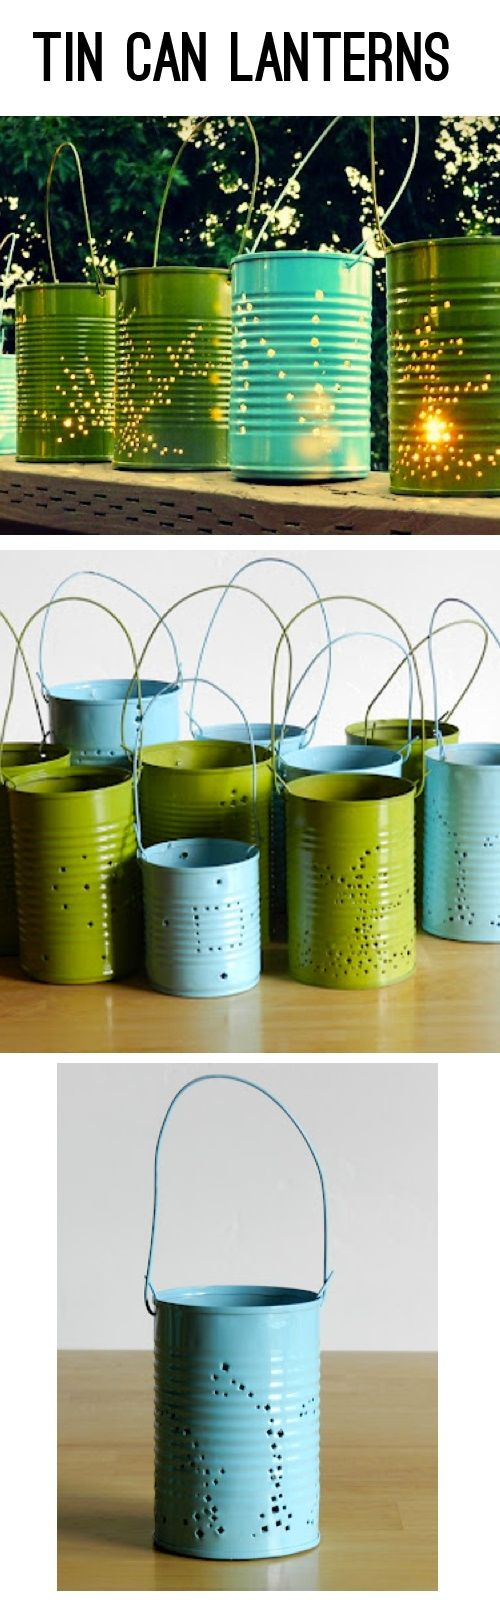 Pinterest - Diy tin can ideas ...